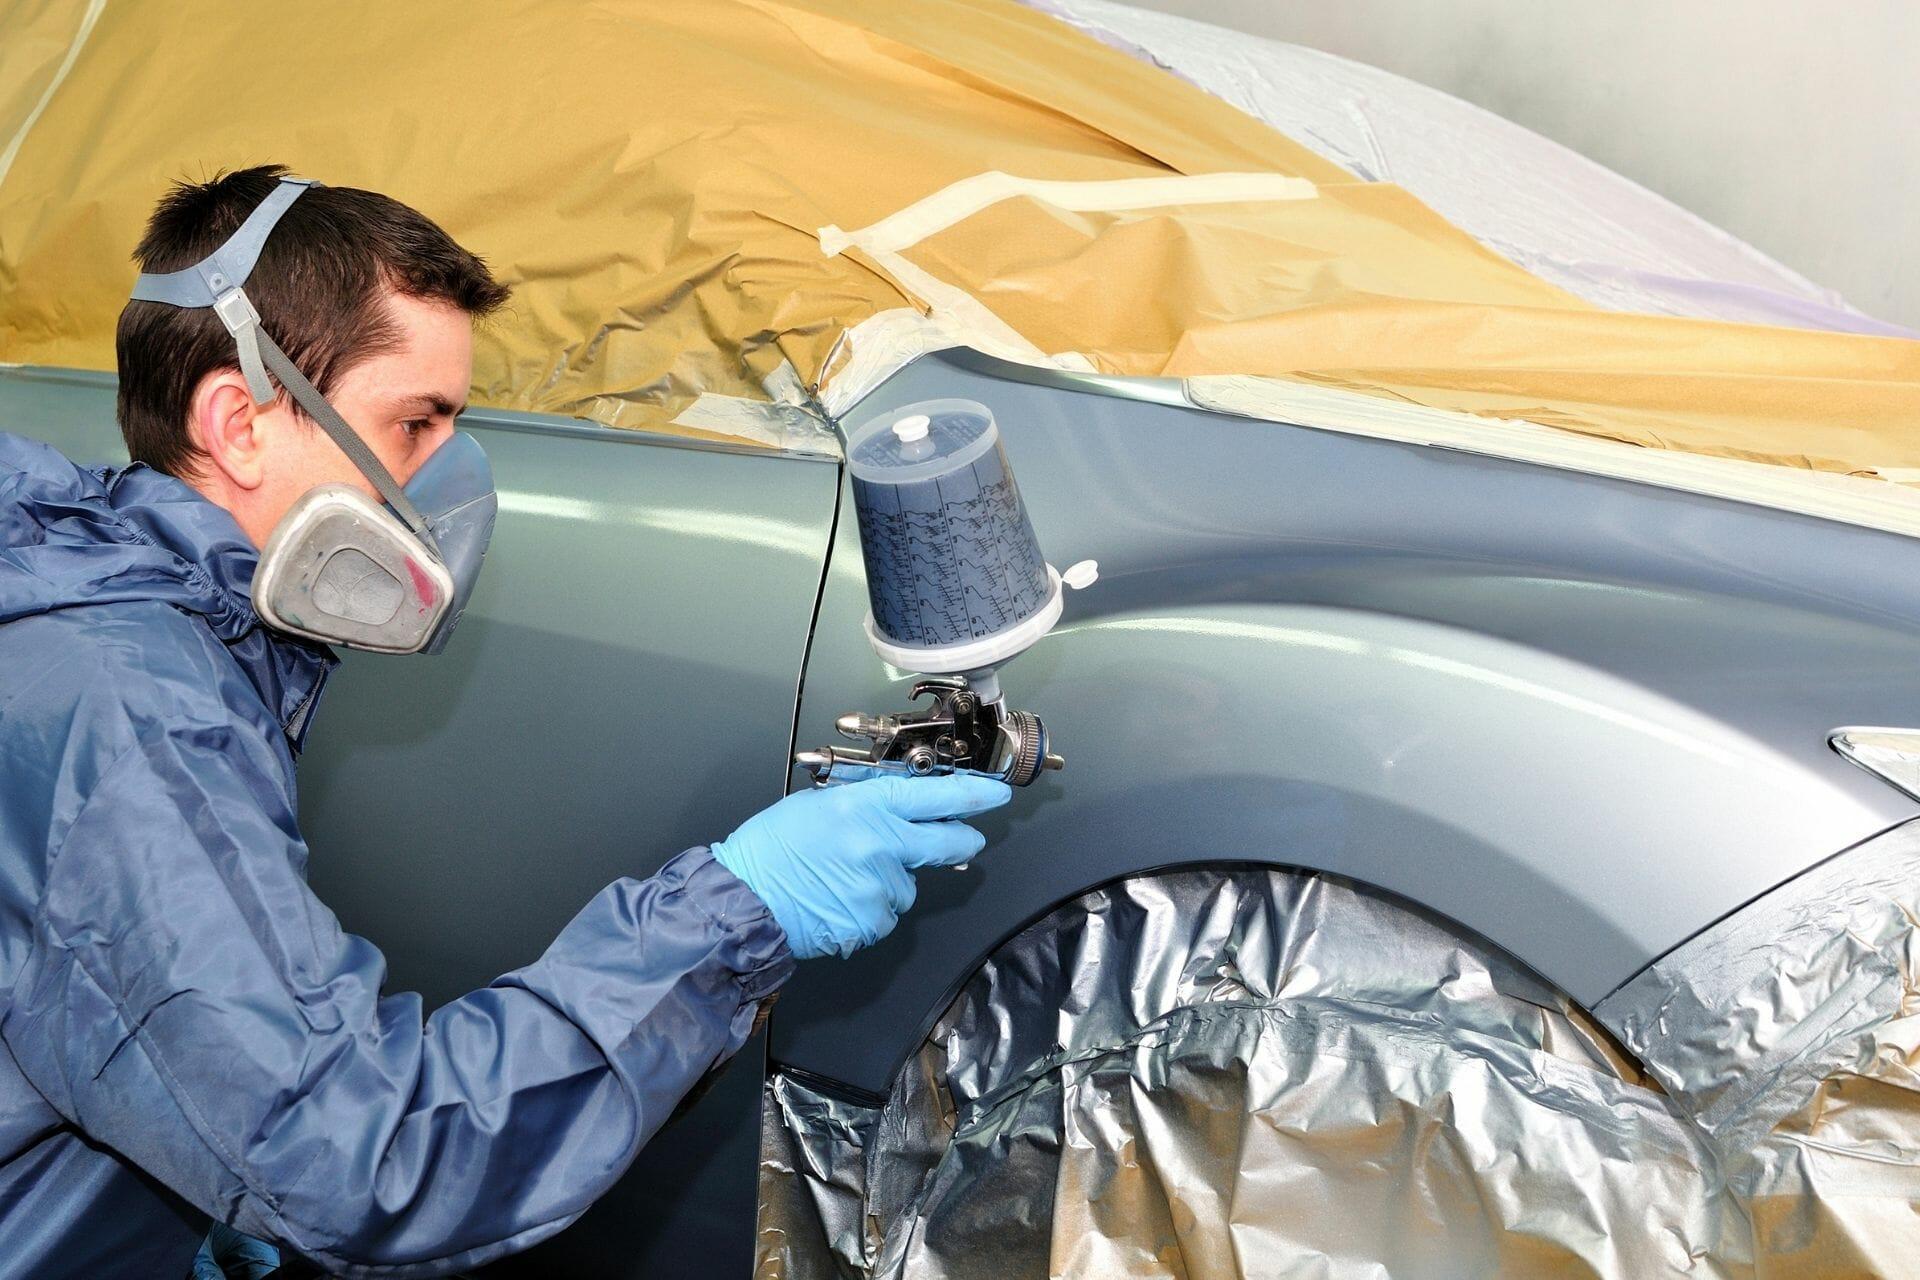 guy spraying car paint